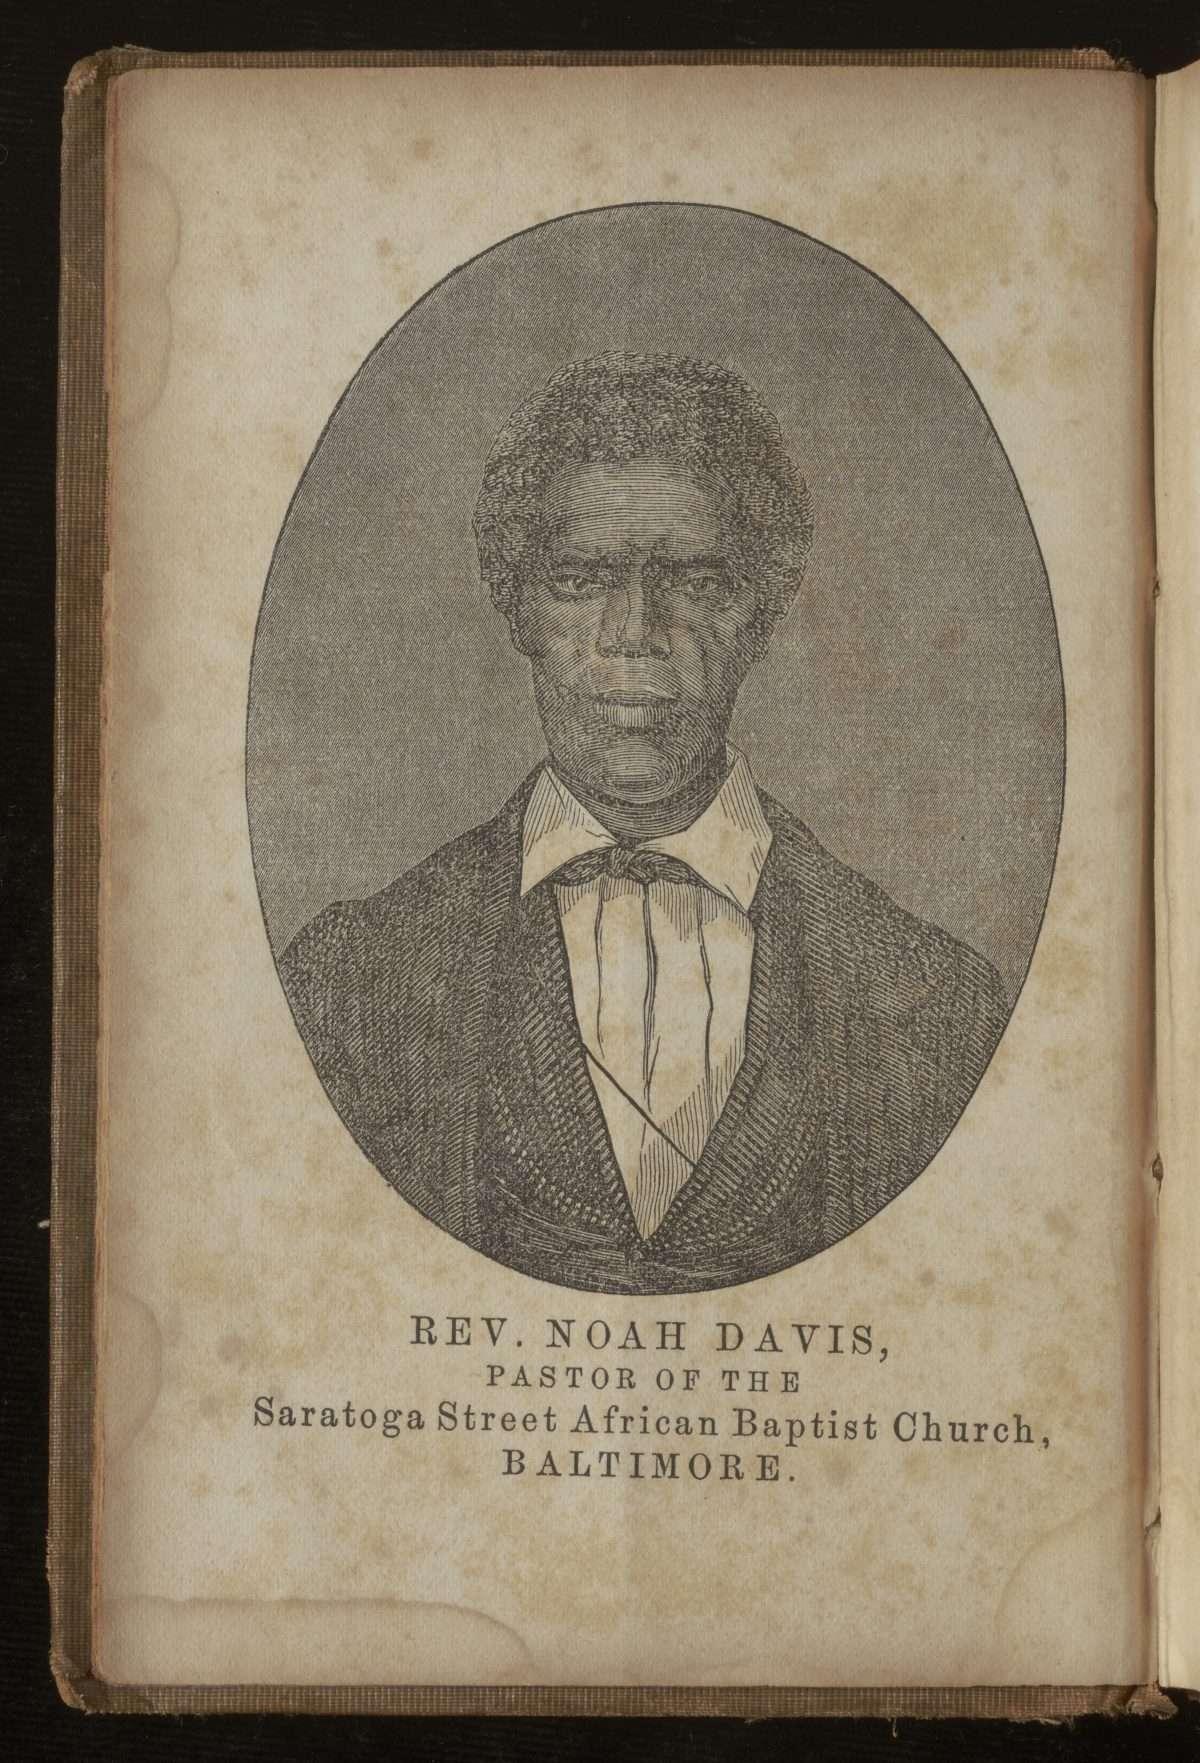 Reverend Noah Davis